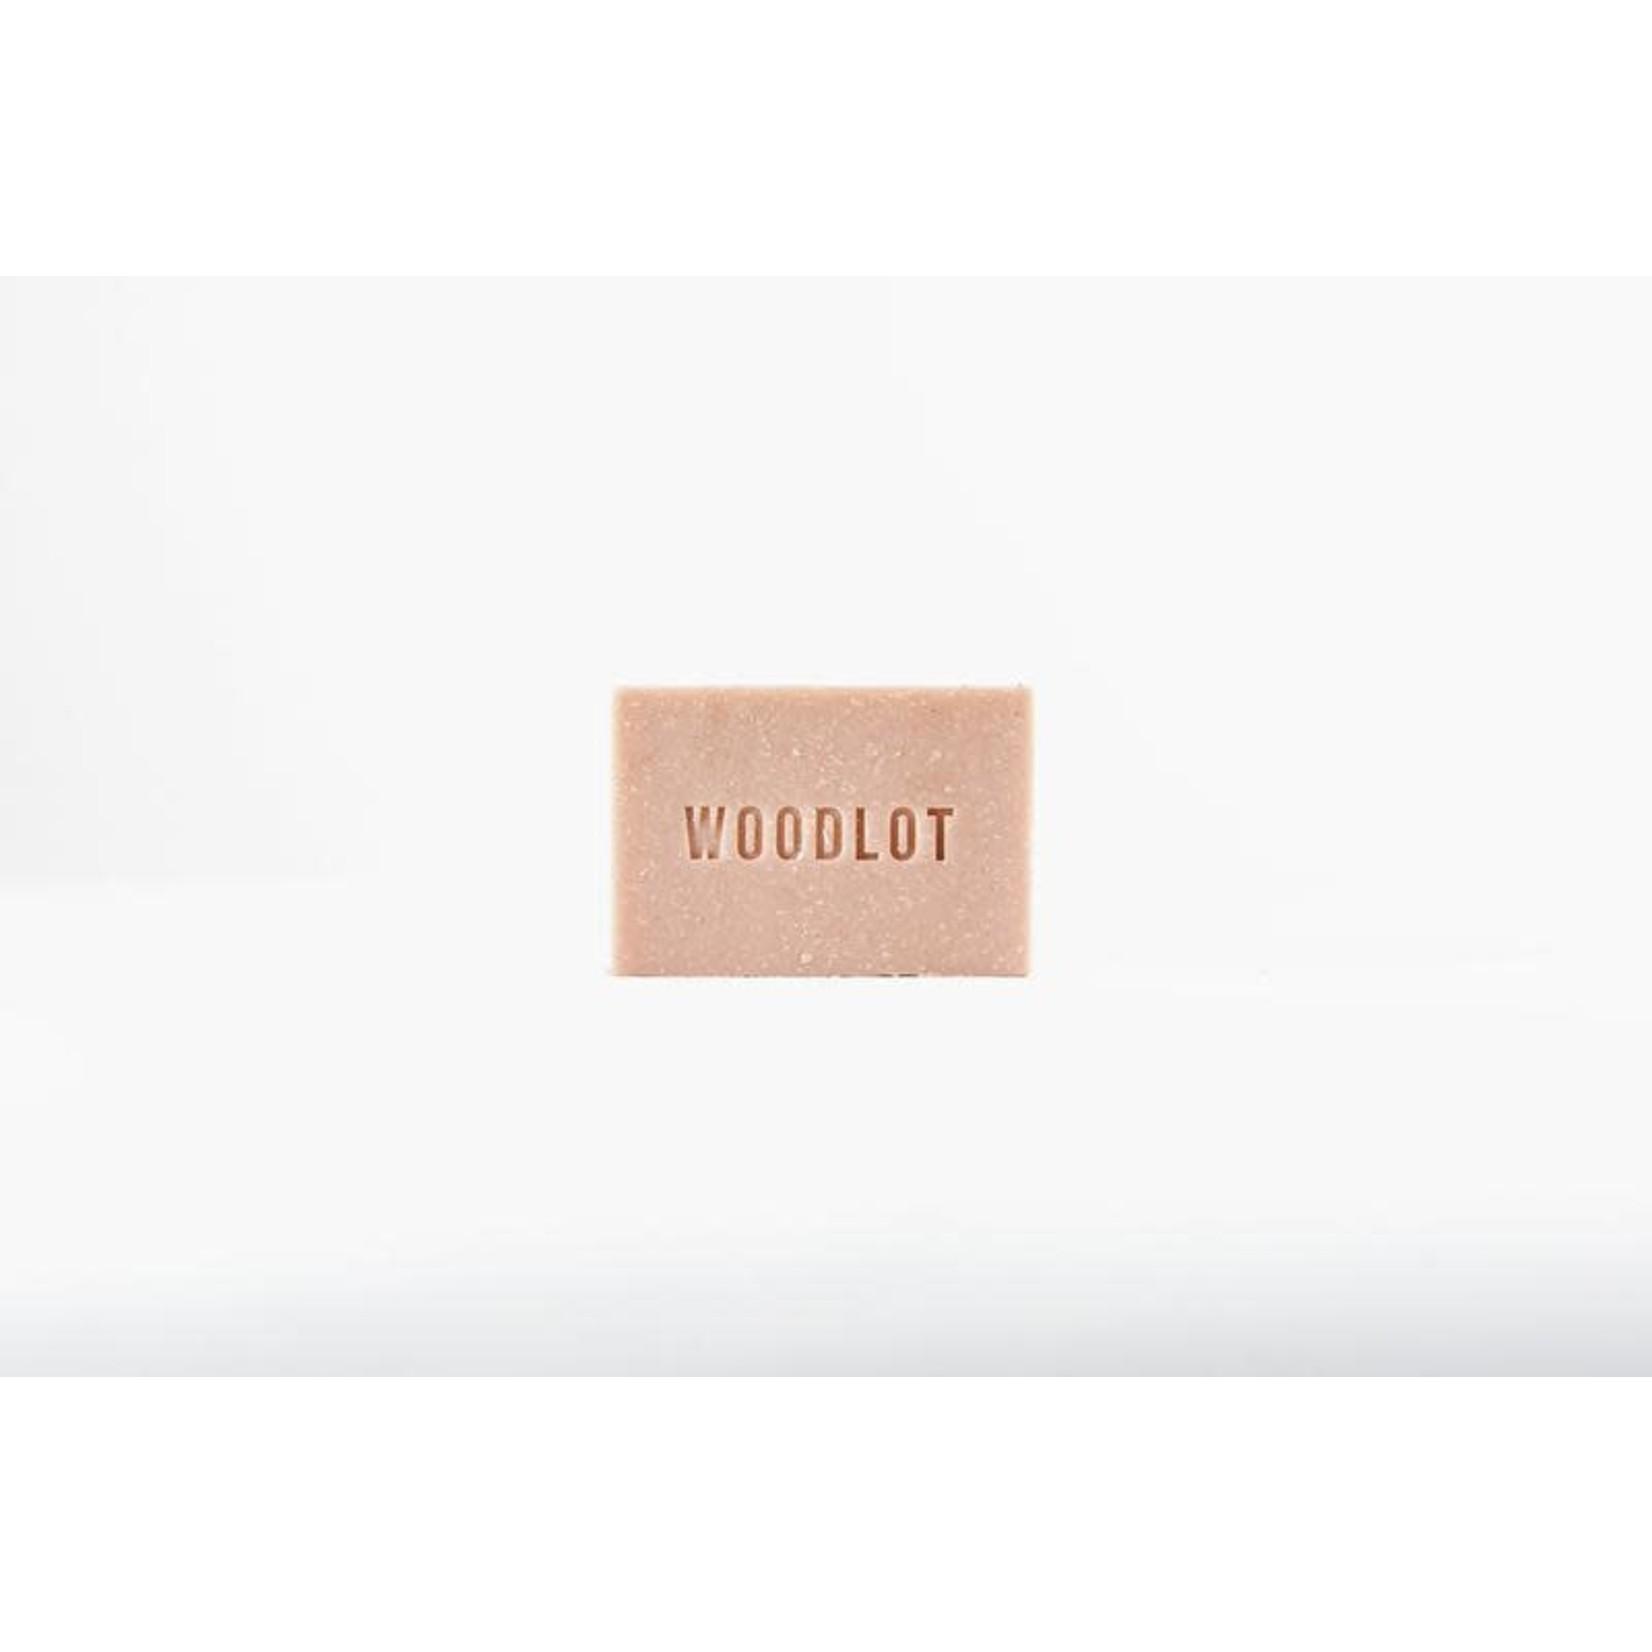 Woodlot Woodlot - savon amour